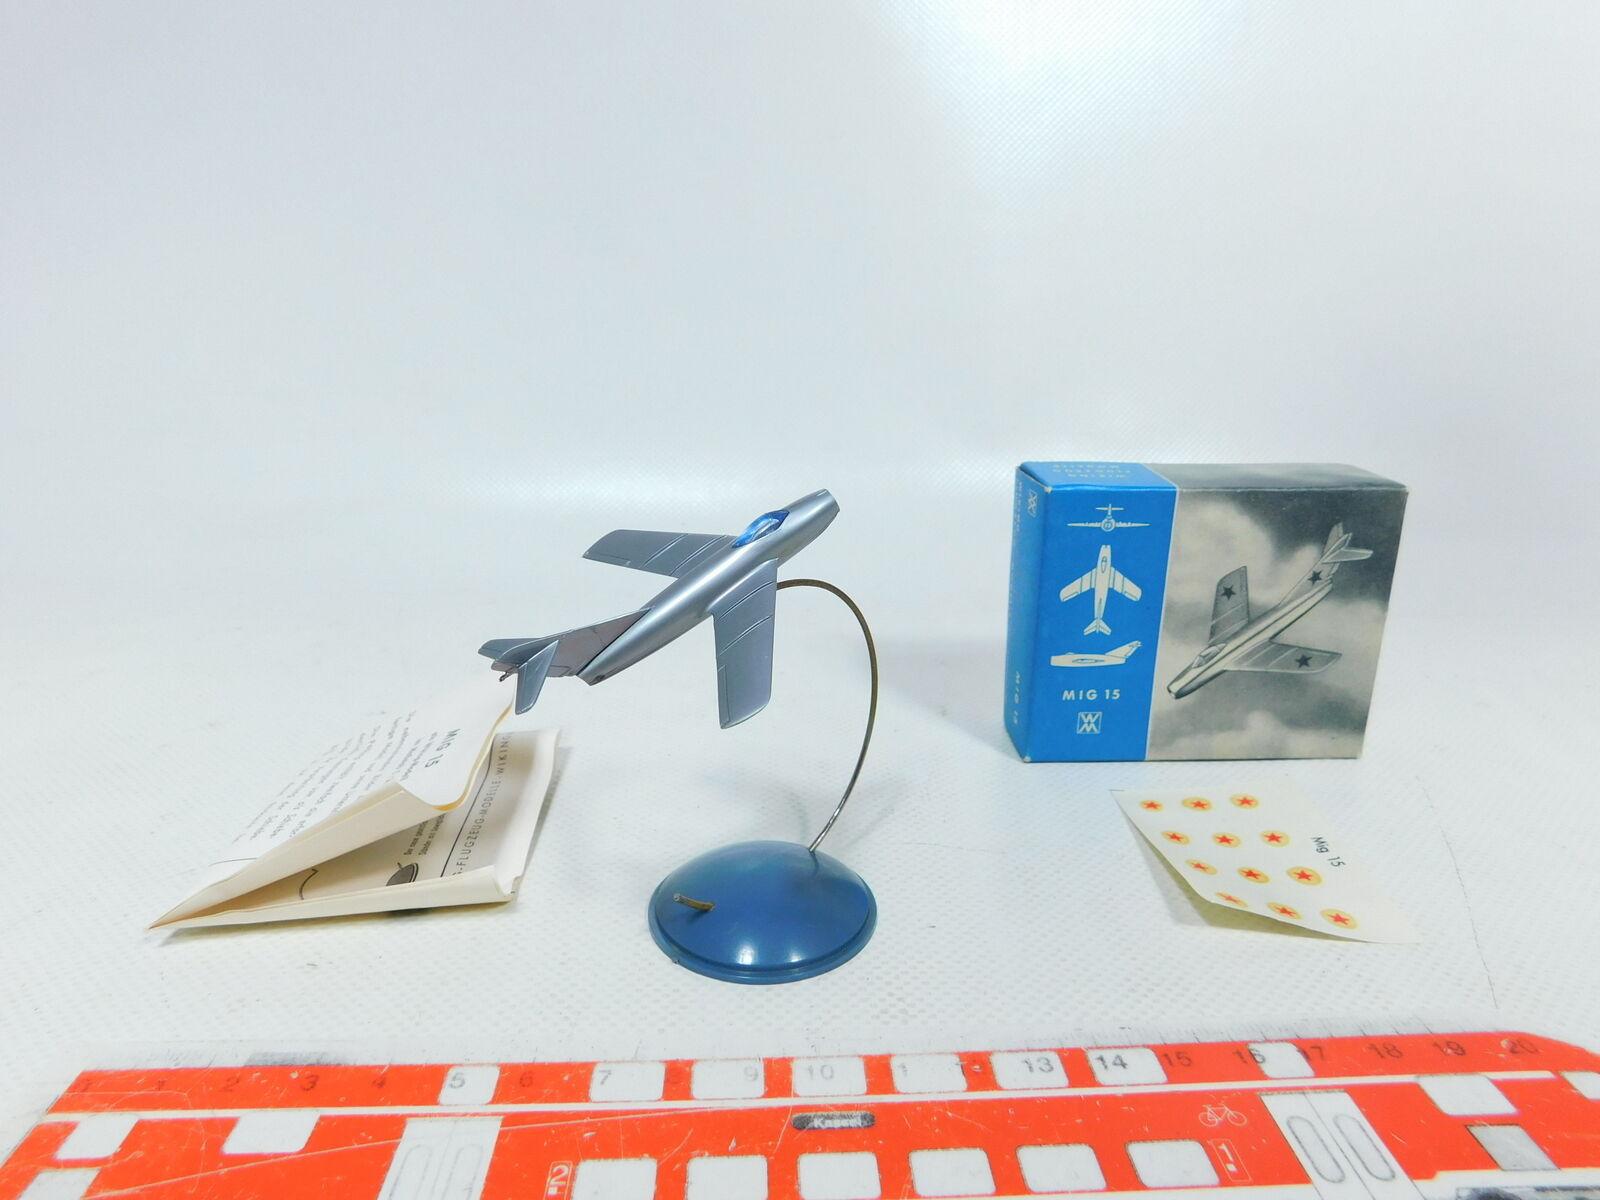 Bx420-0, 5  Wiking 1 200 avion chasseur BOMBARDIER MIG 15, très bien + neuf dans sa boîte